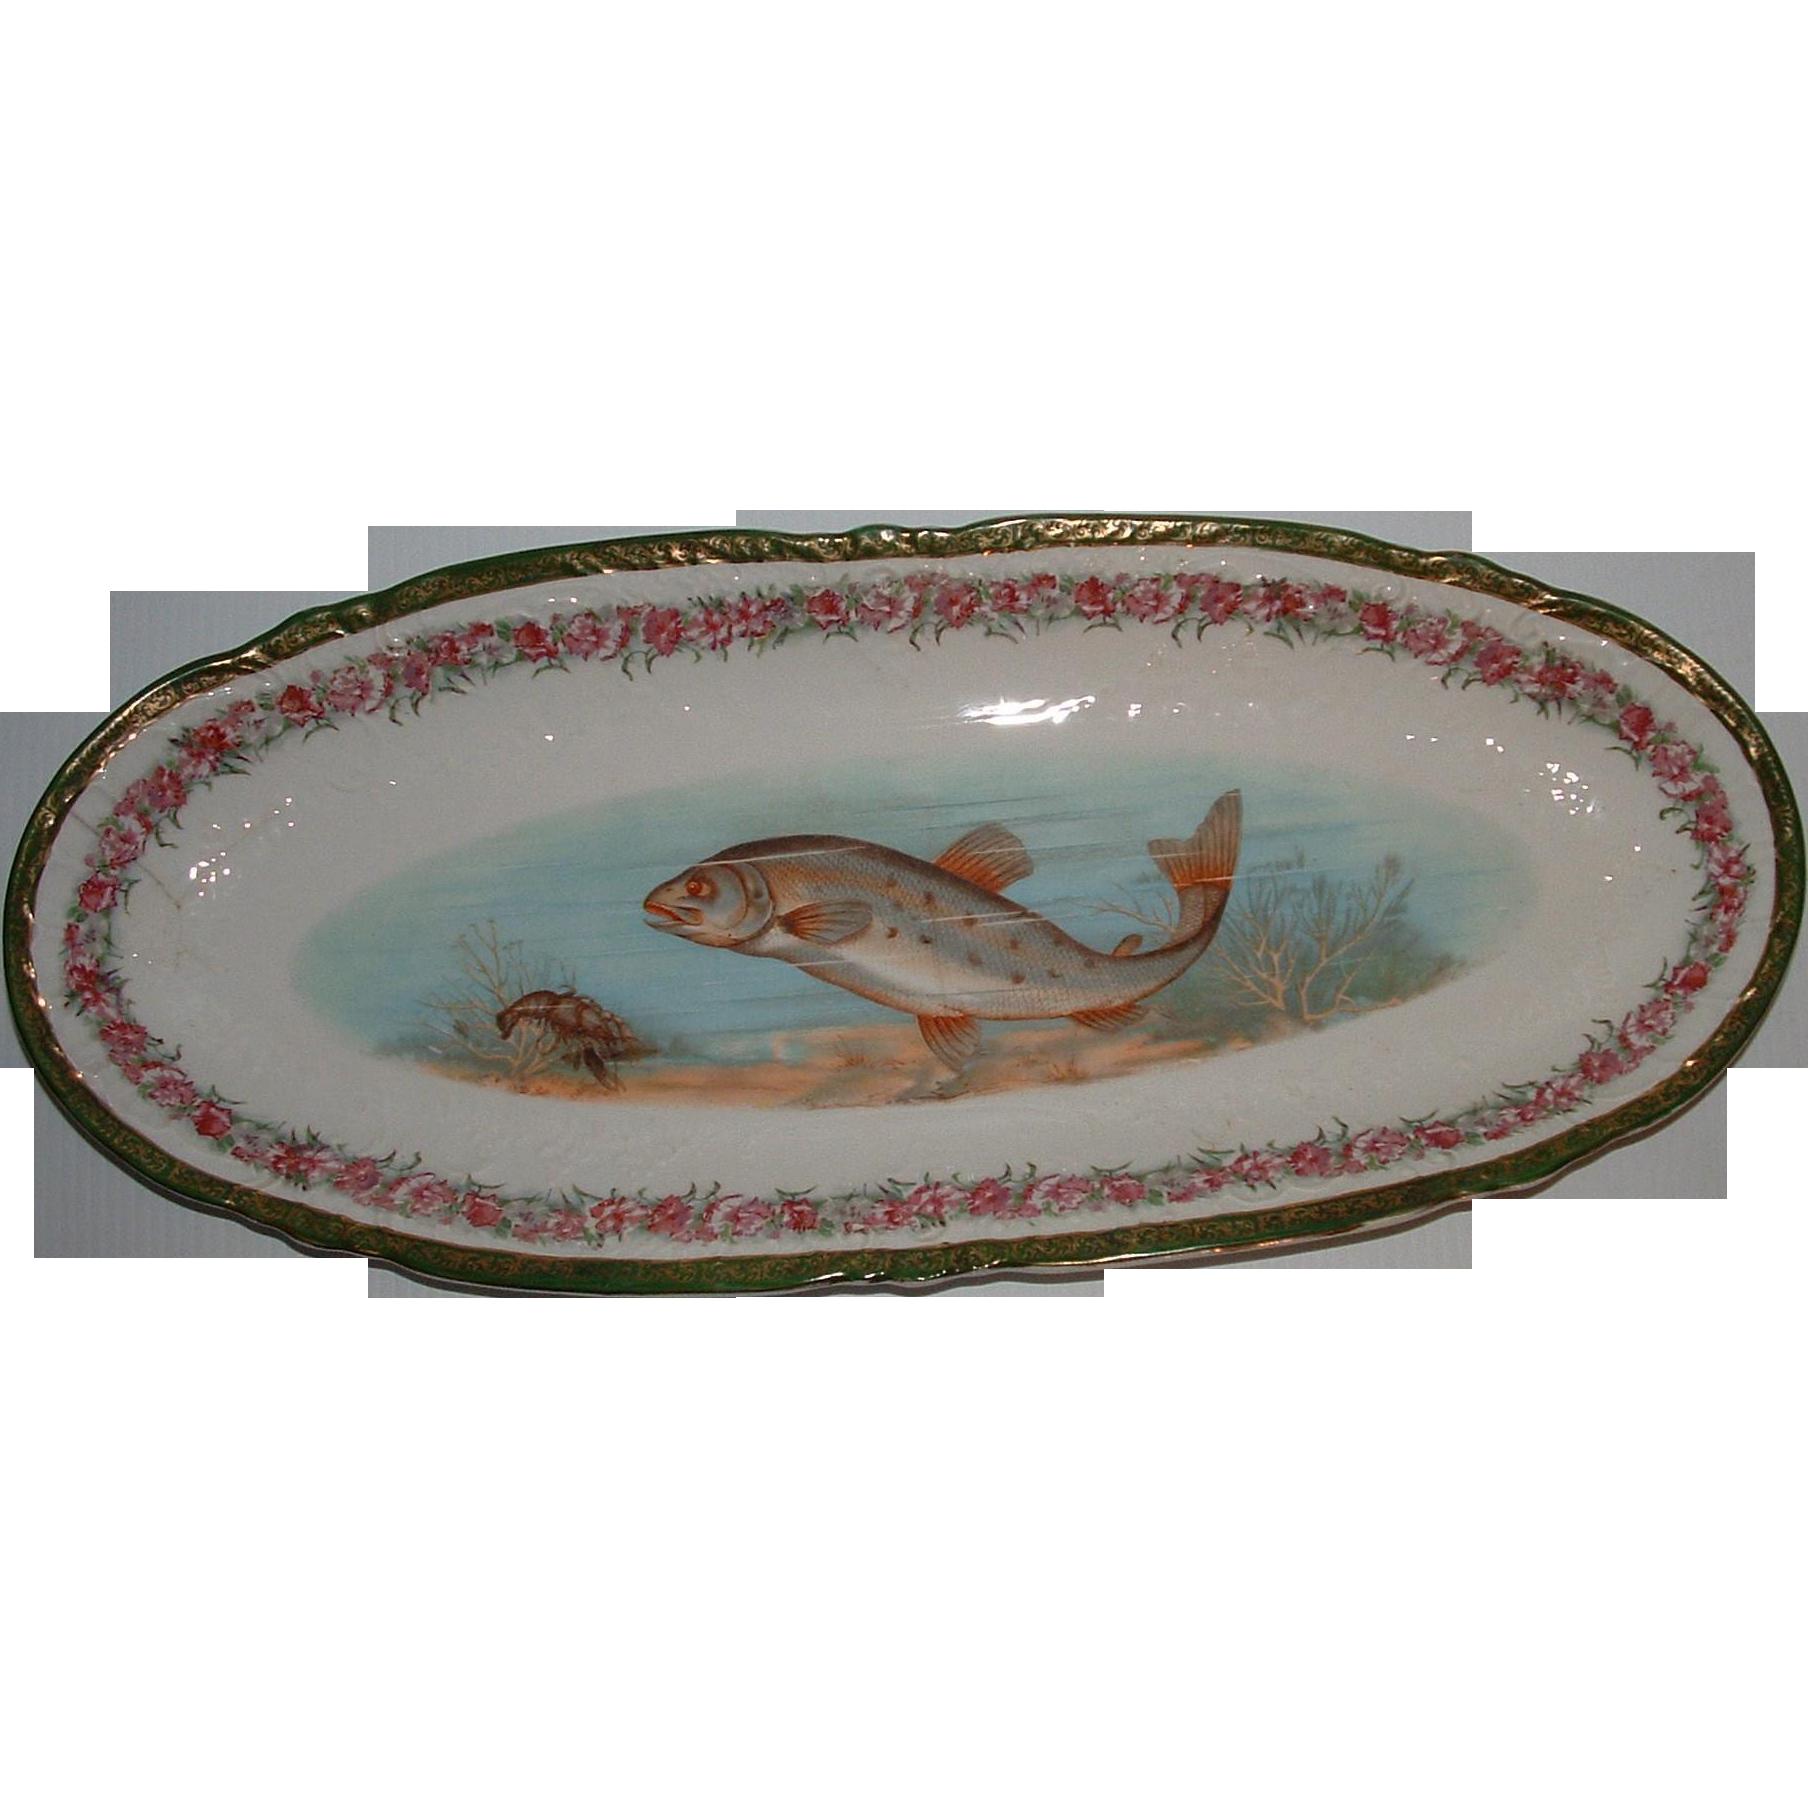 victoria carlsbad austria porcelain | eBay